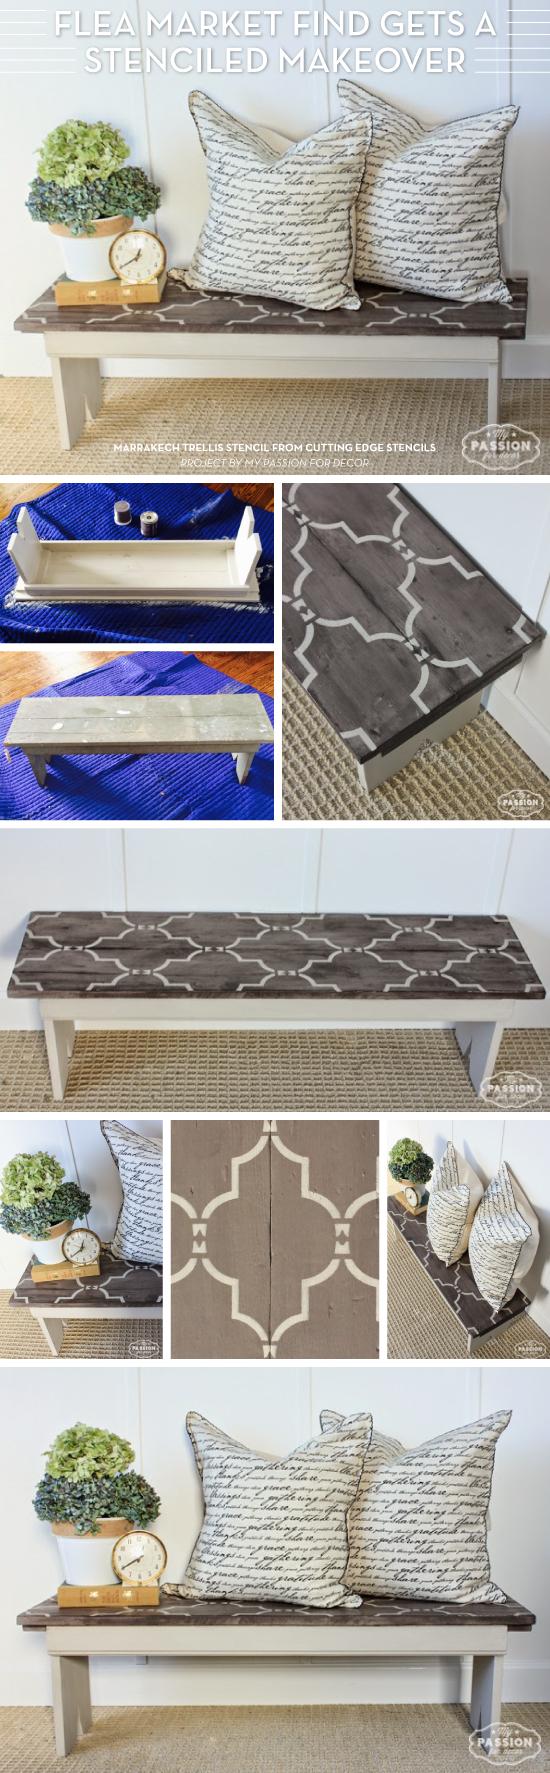 Cutting Edge Stencils shares a DIY stenciled bench makeover using the Marrakech Trellis Stencil. http://www.cuttingedgestencils.com/moroccan-stencil-marrakech.html